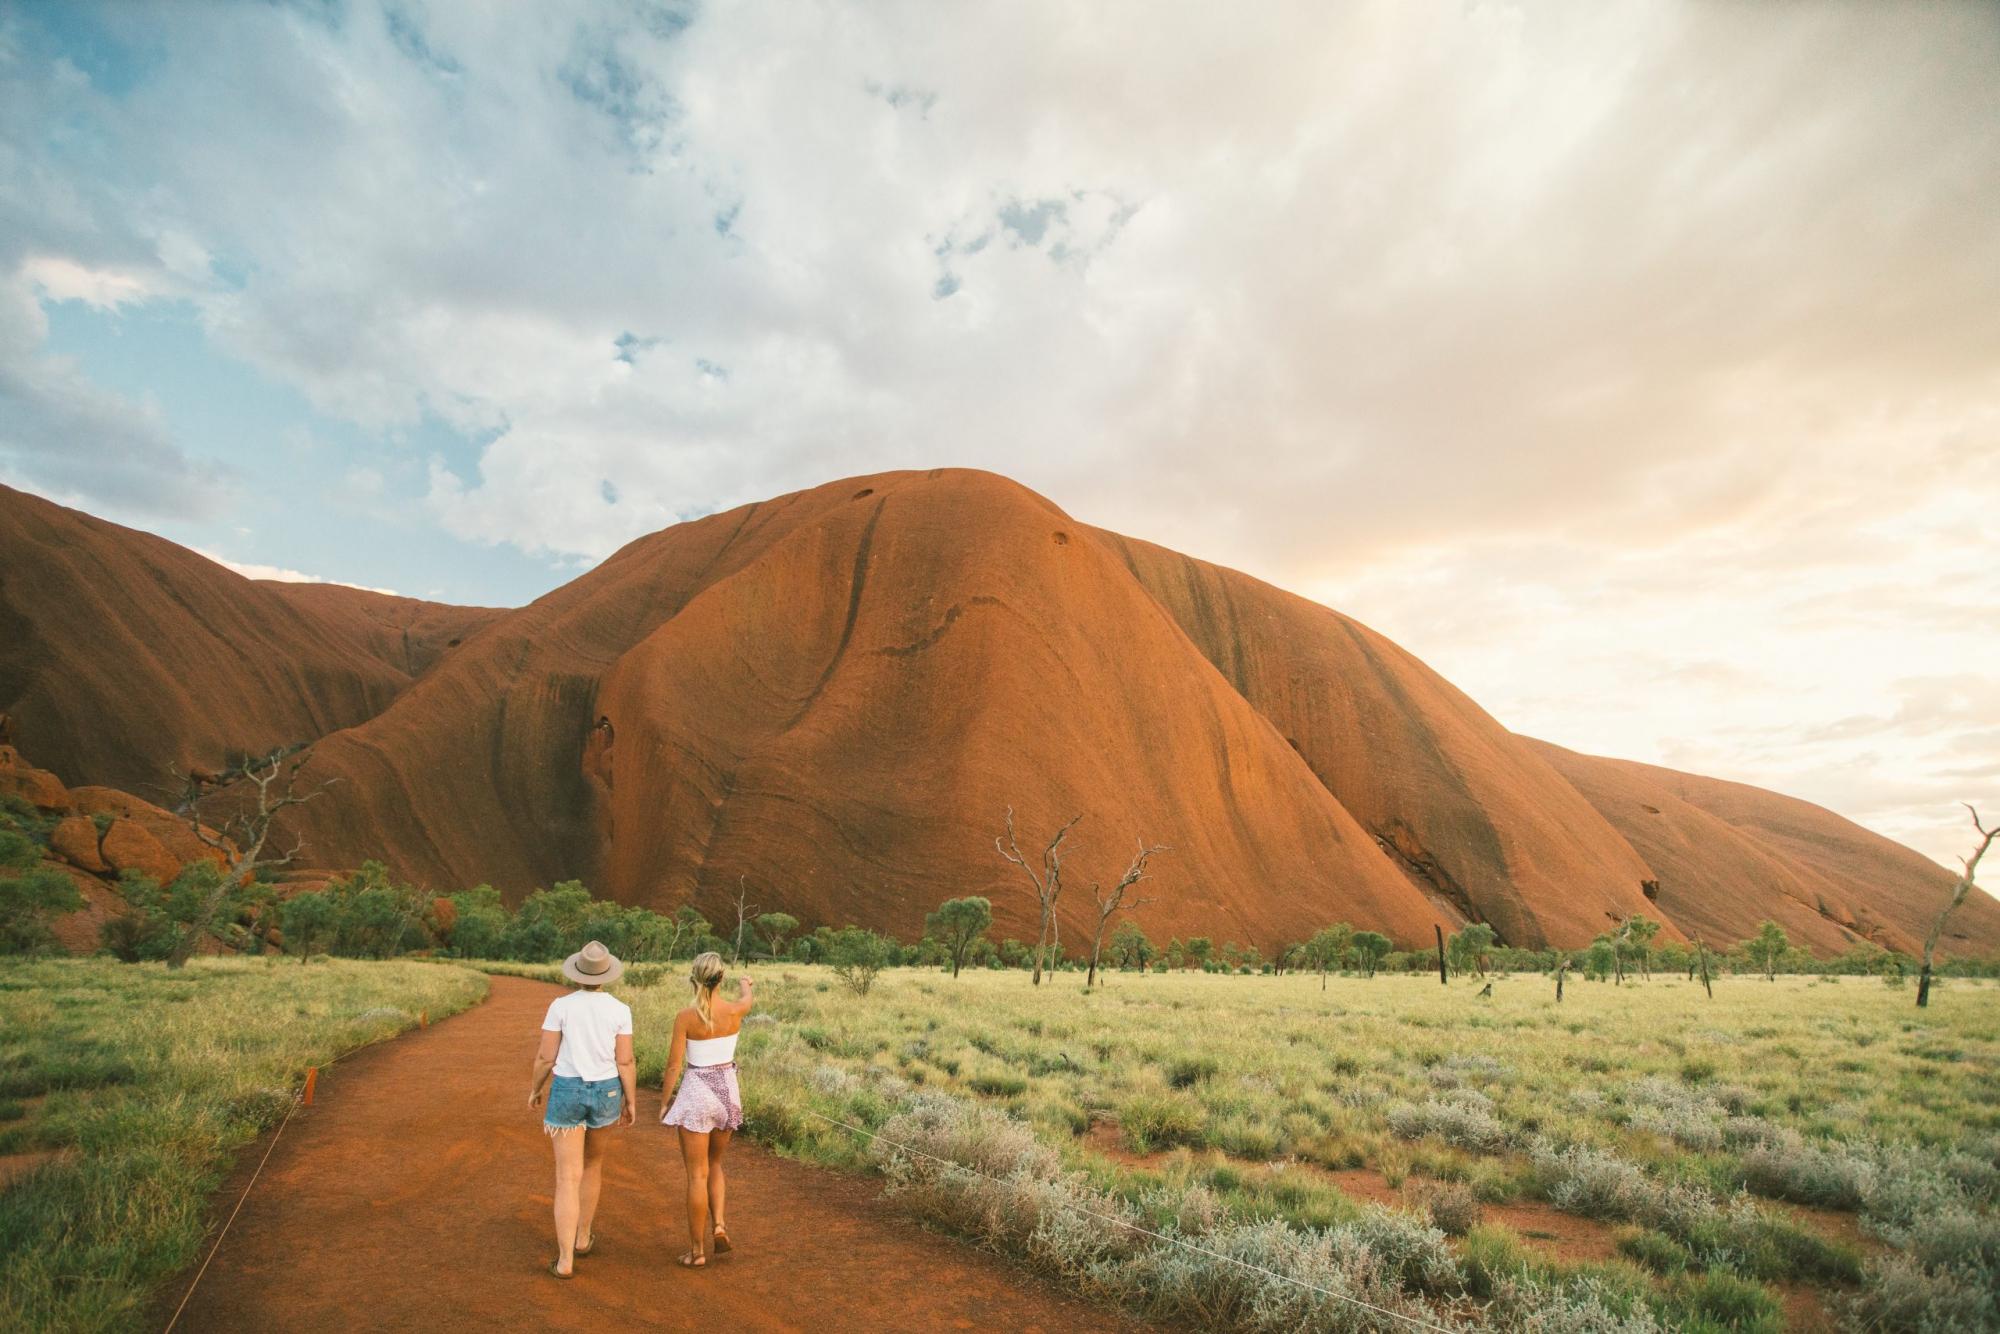 Uluru & Kata Tjuta Cultural Adventure | Uluru, Uluru-Kata Tjuta National Park, Central Australia, Northern Territory